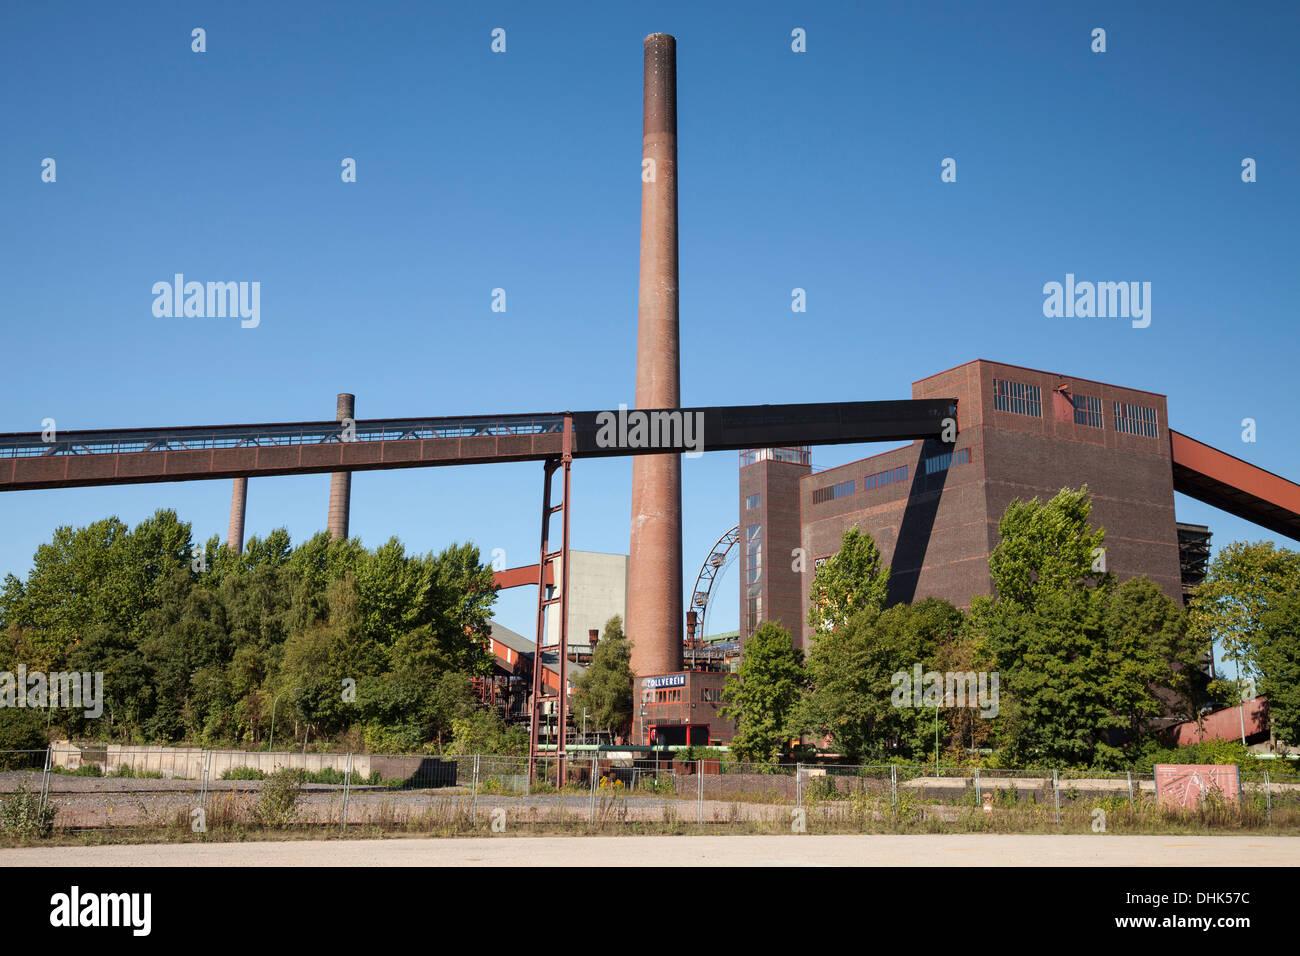 Germany, North Rhine-Westphalia, Essen, Zollverein Coal Mine Industrial Complex - Stock Image